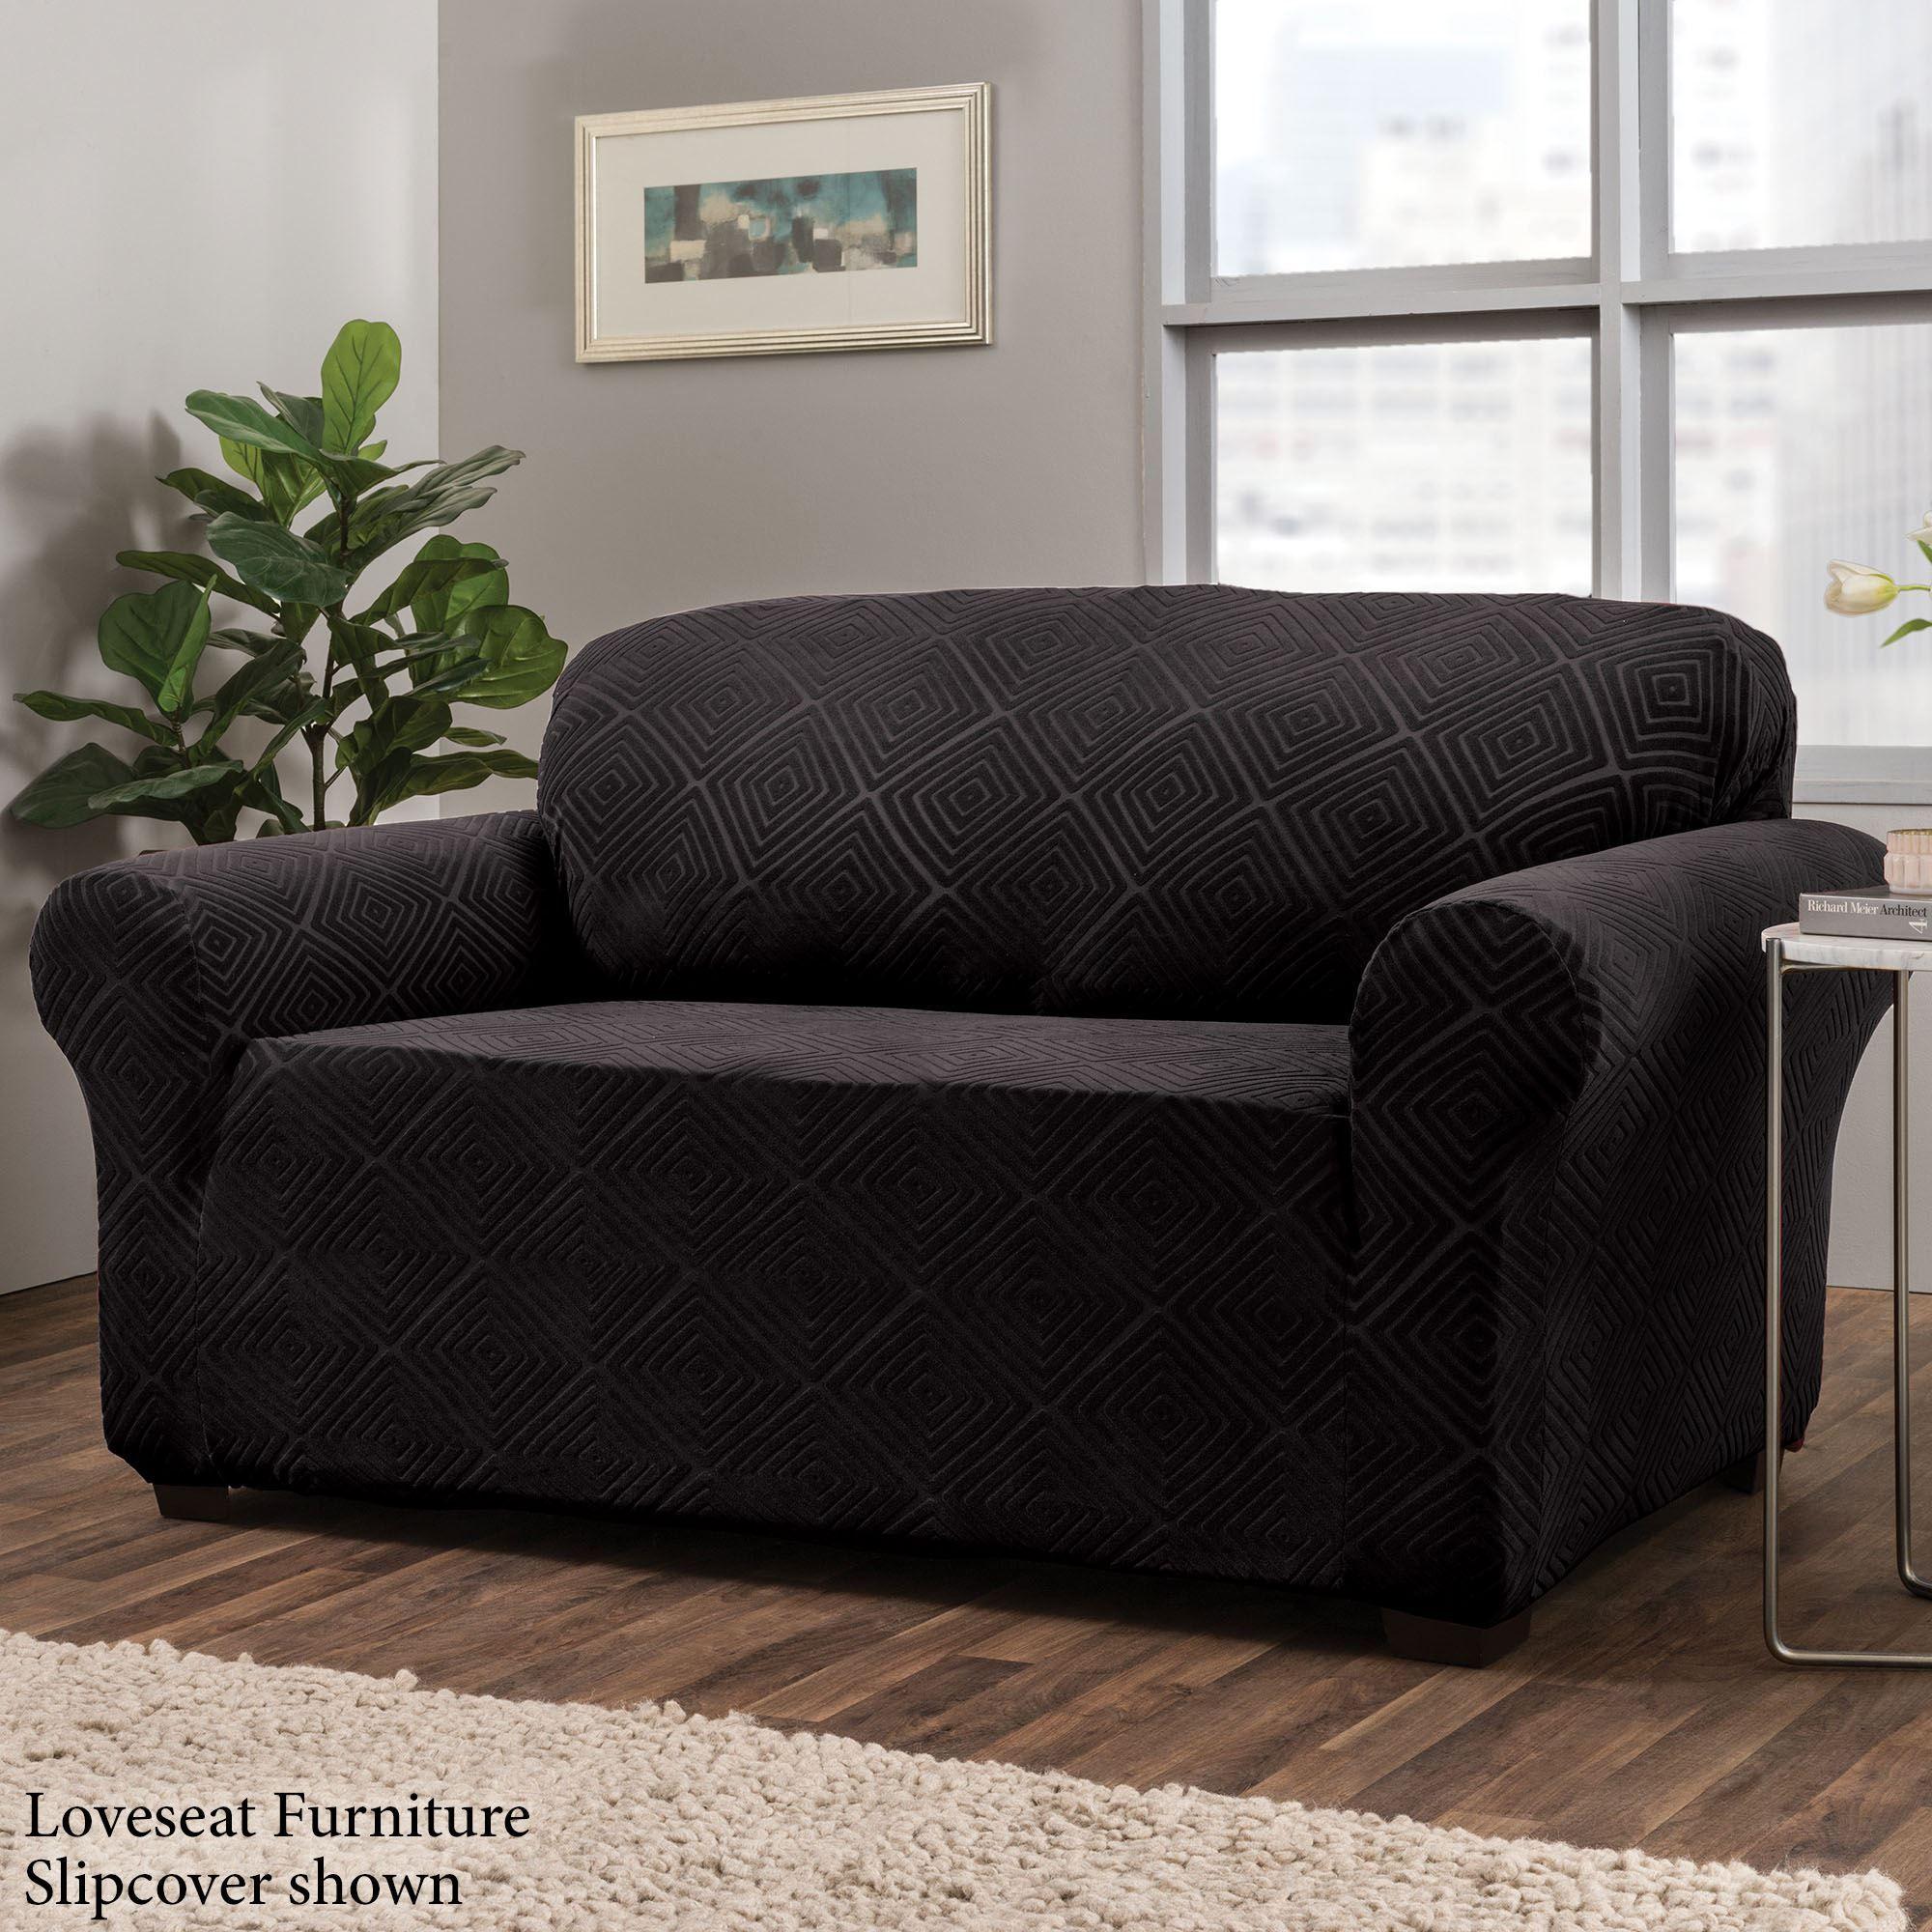 Lapeer Black Stretch Furniture Slipcovers